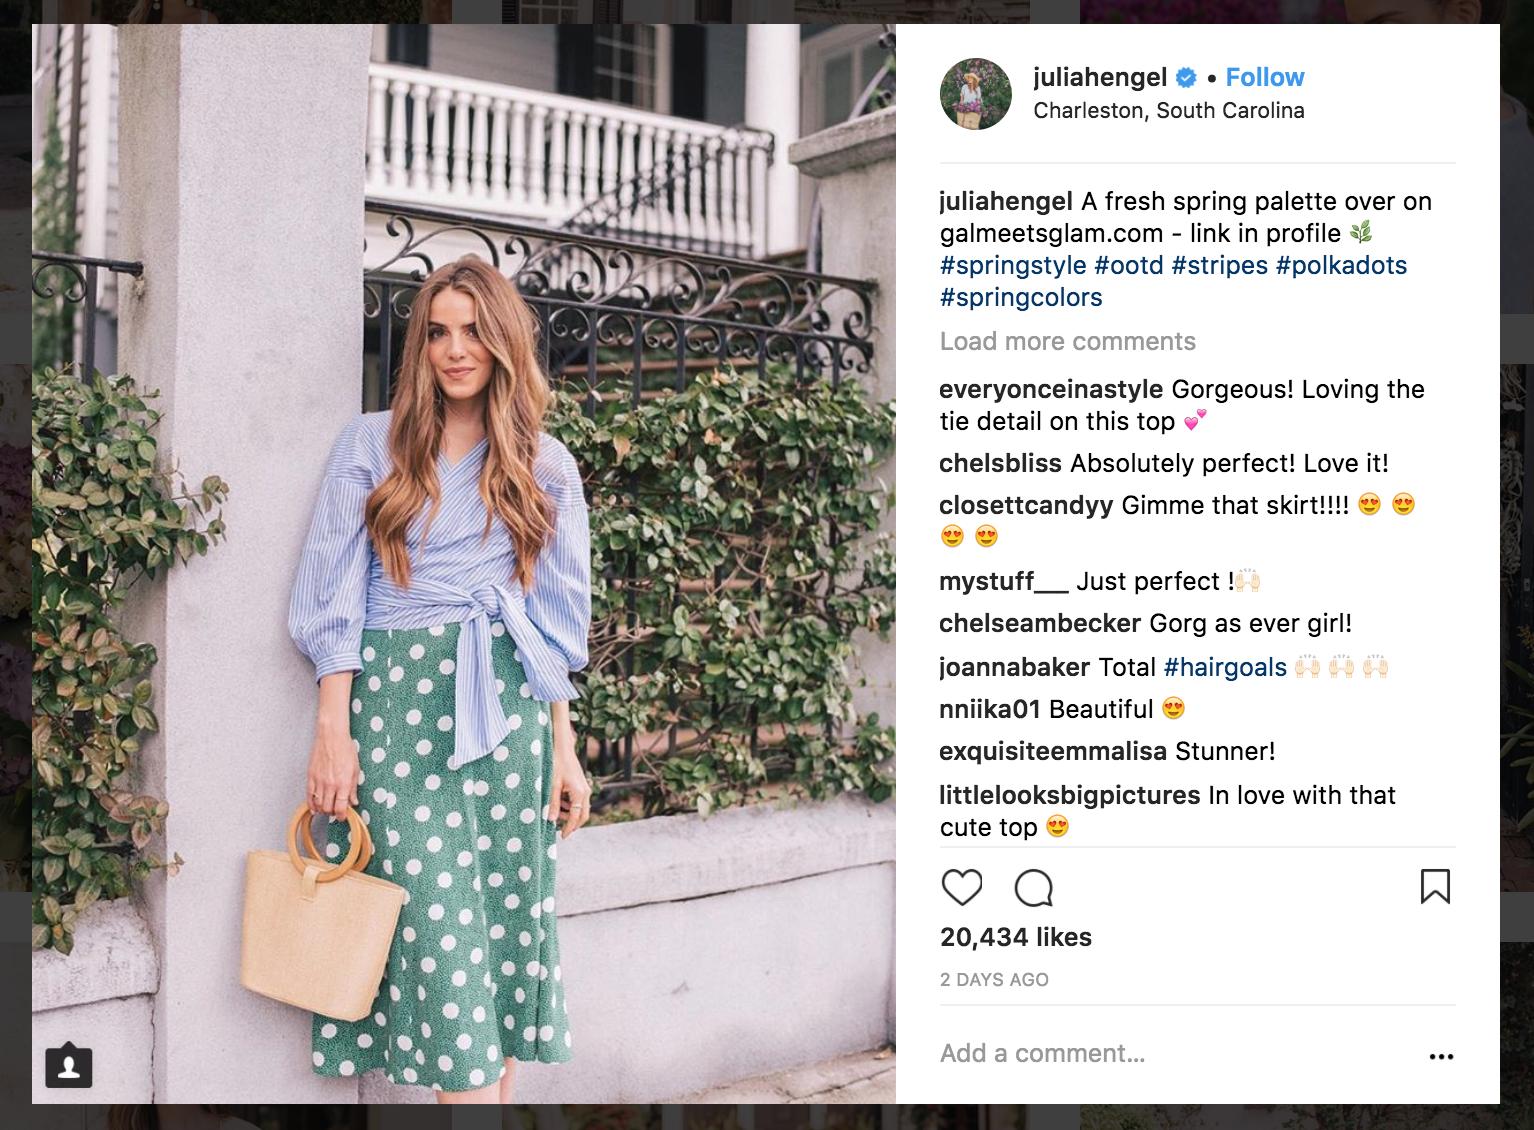 Instagram Sponsored Post - Schedugram